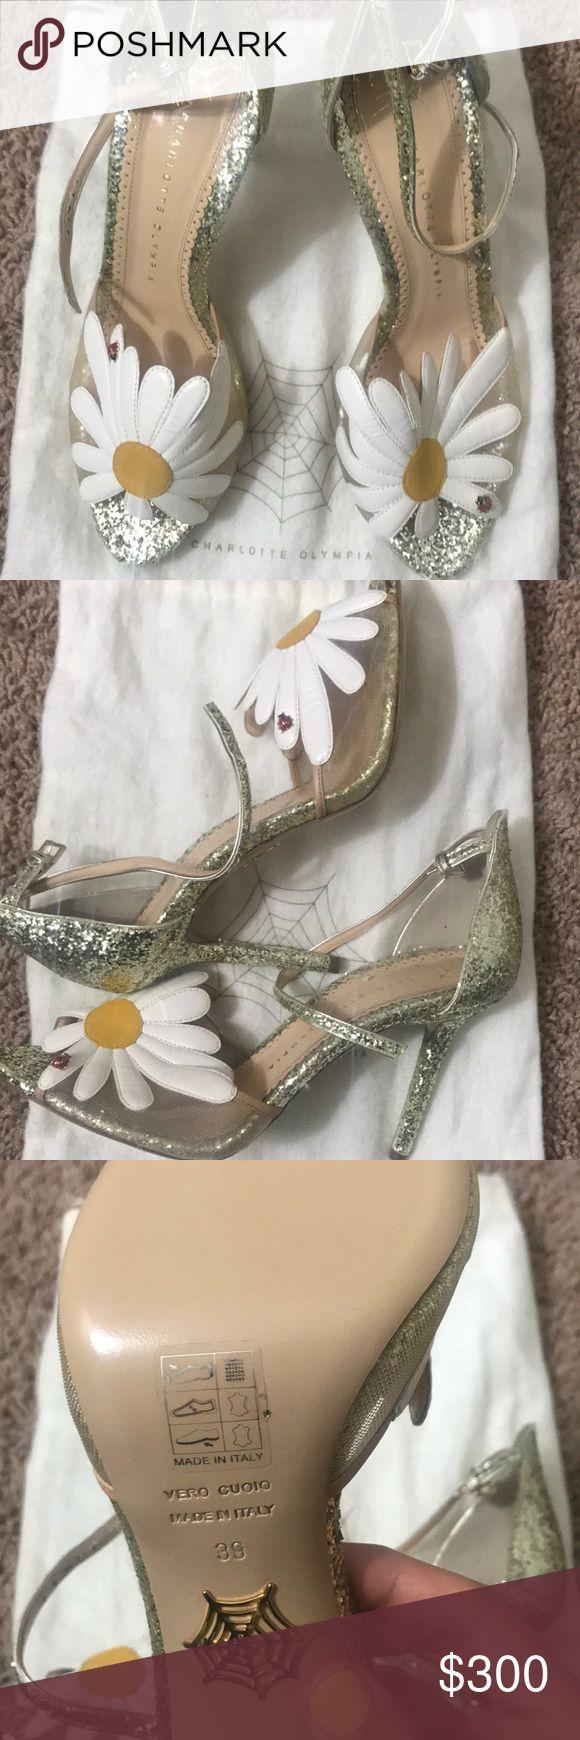 Charlotte Olympia Marguerite Glitter Sandals Heels Gorgeous summer sandals. Never worn, in bag. Charlotte Olympia Shoes Heels